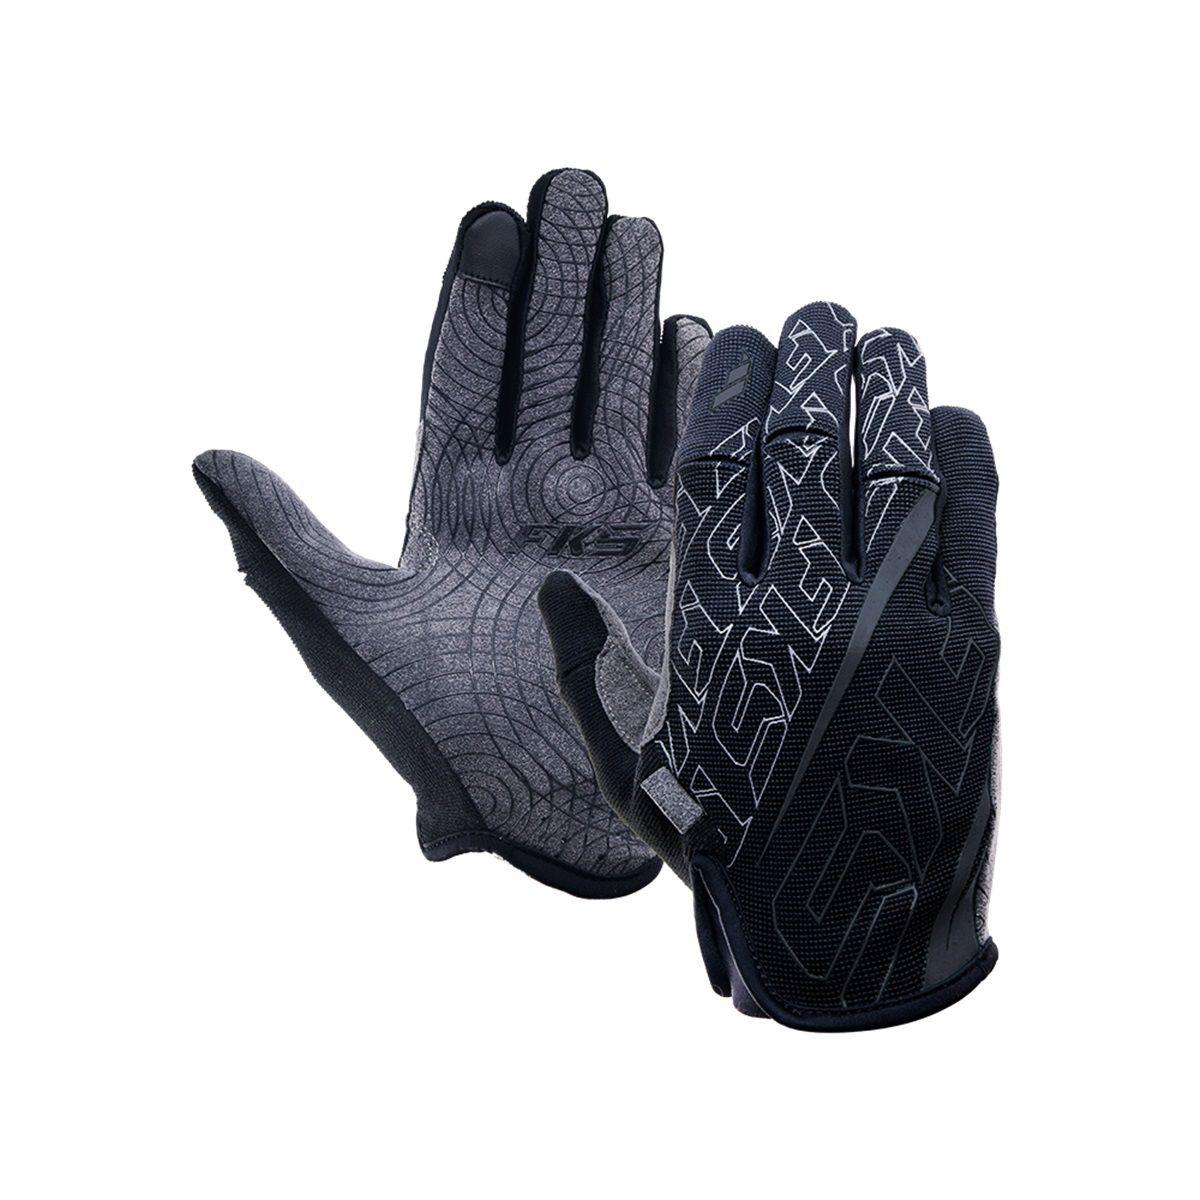 Luva Ciclismo Bike FKS SS Grip Gloves